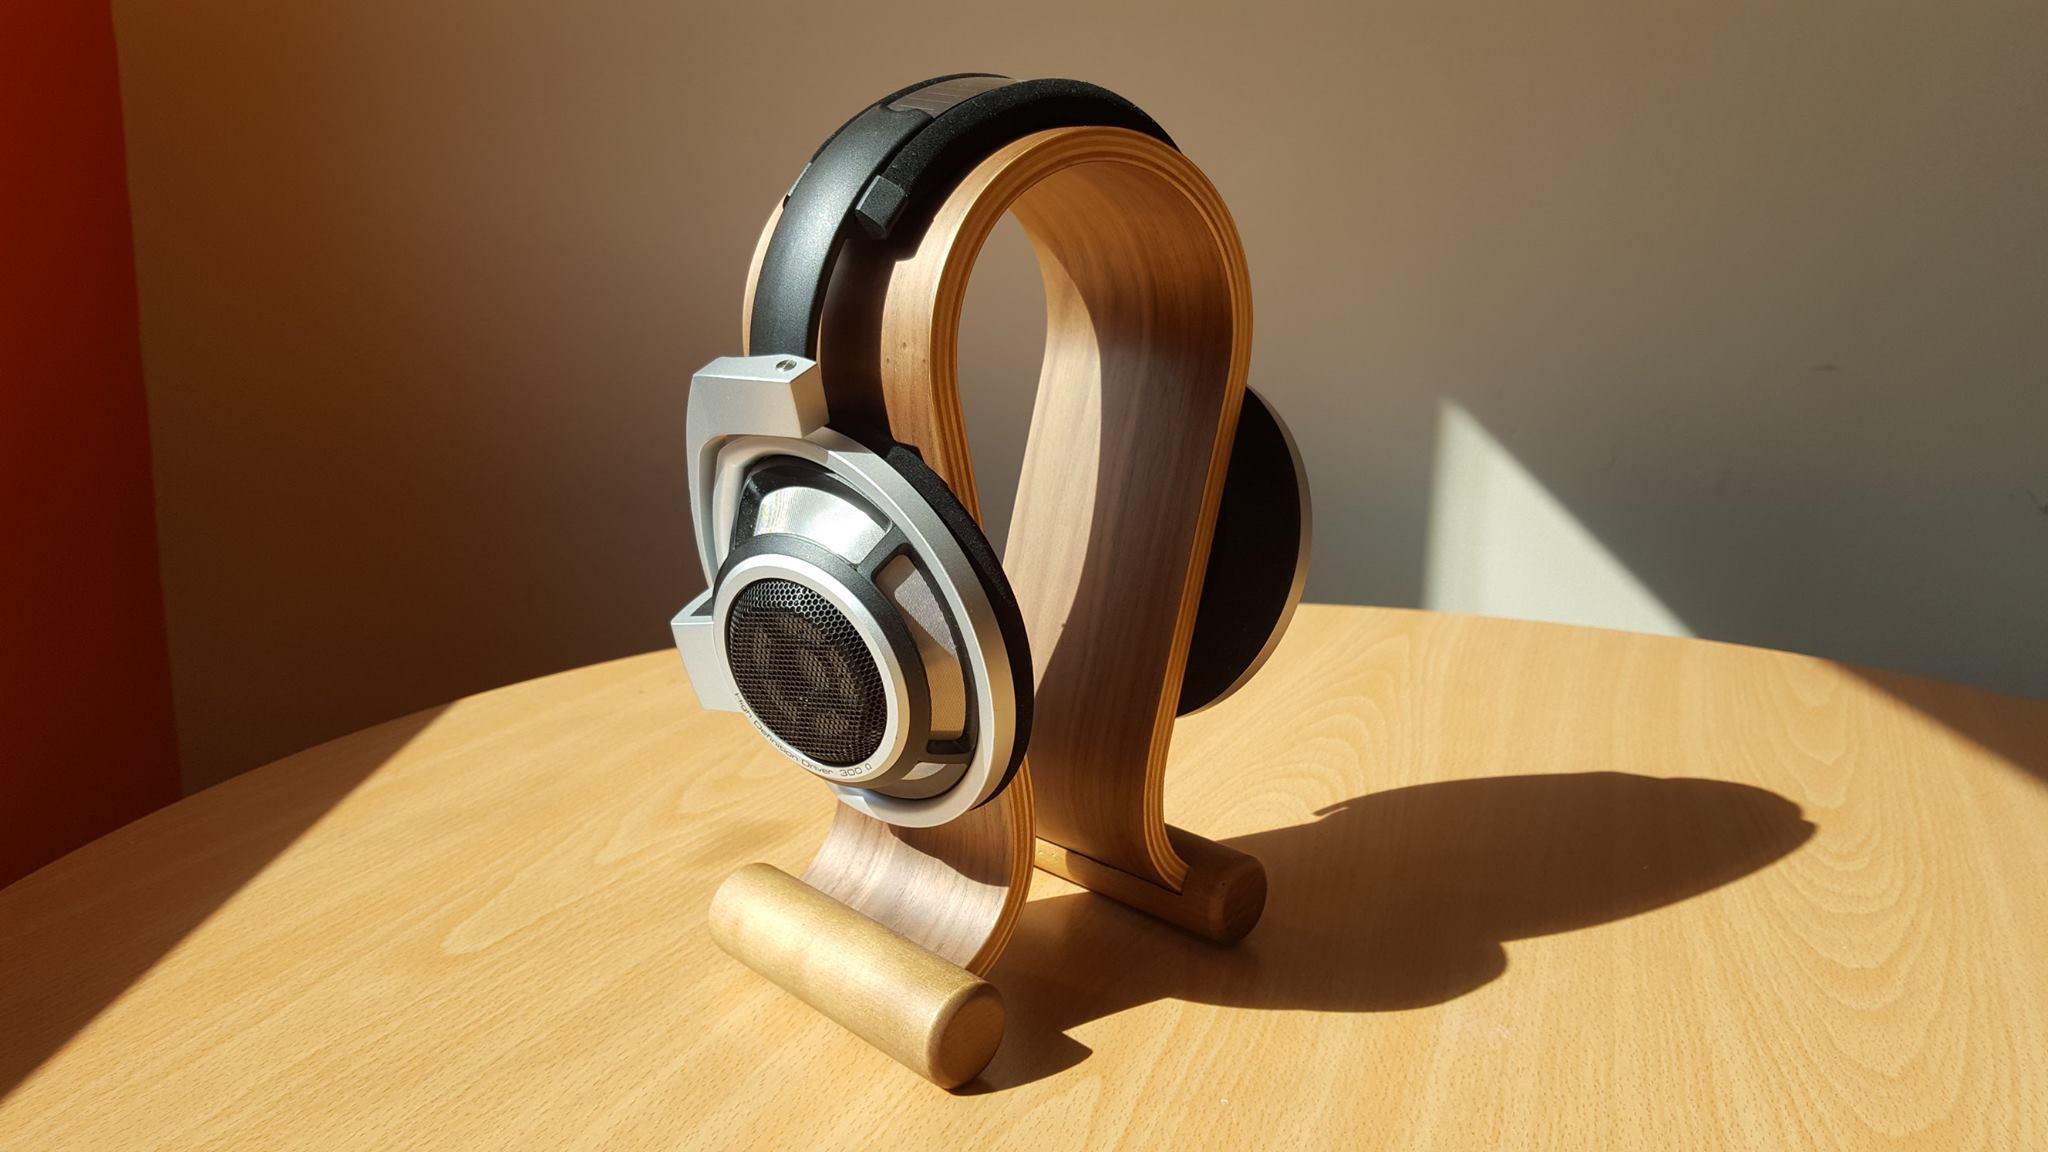 Sennheiser Hd800 Superdupont Resonator Mod Aornic Reviews Hd 800 Dynamic Stereo Headphone